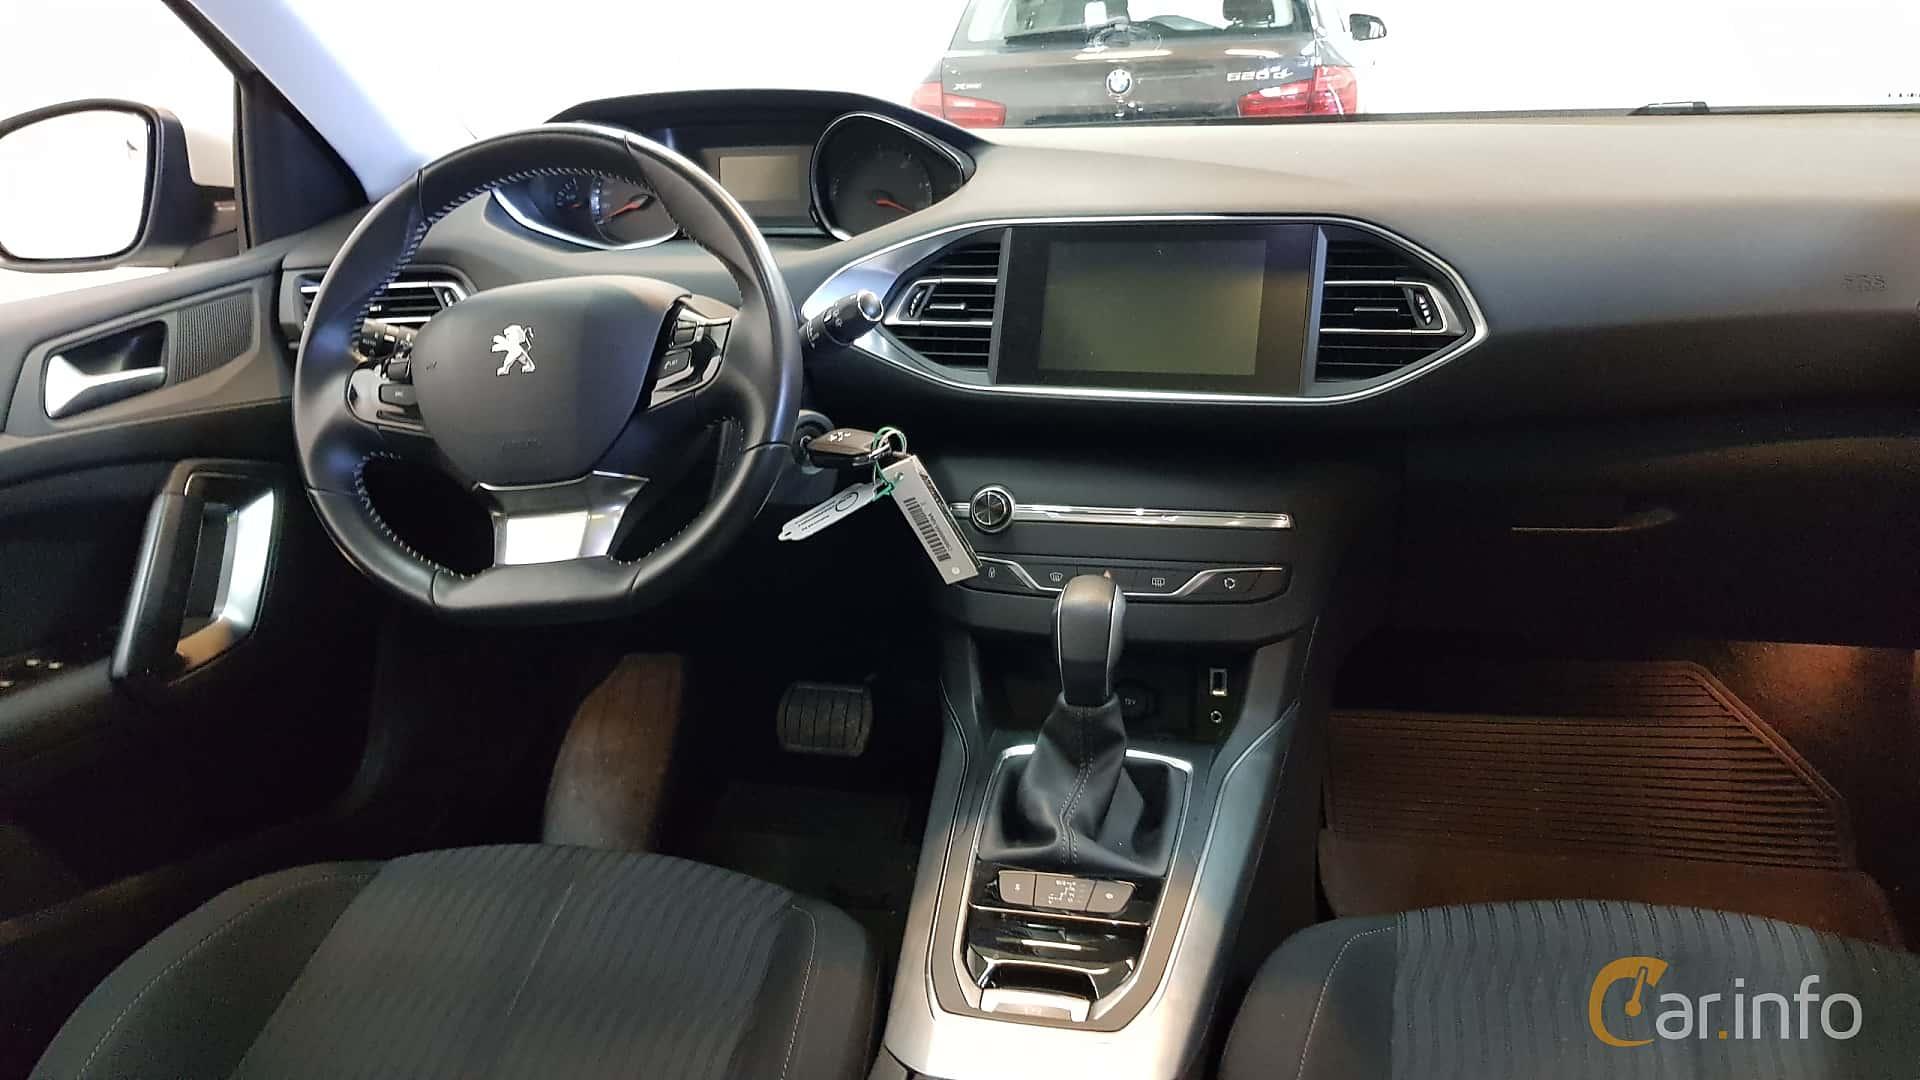 peugeot-308-sw-interior-2-521376.jpg